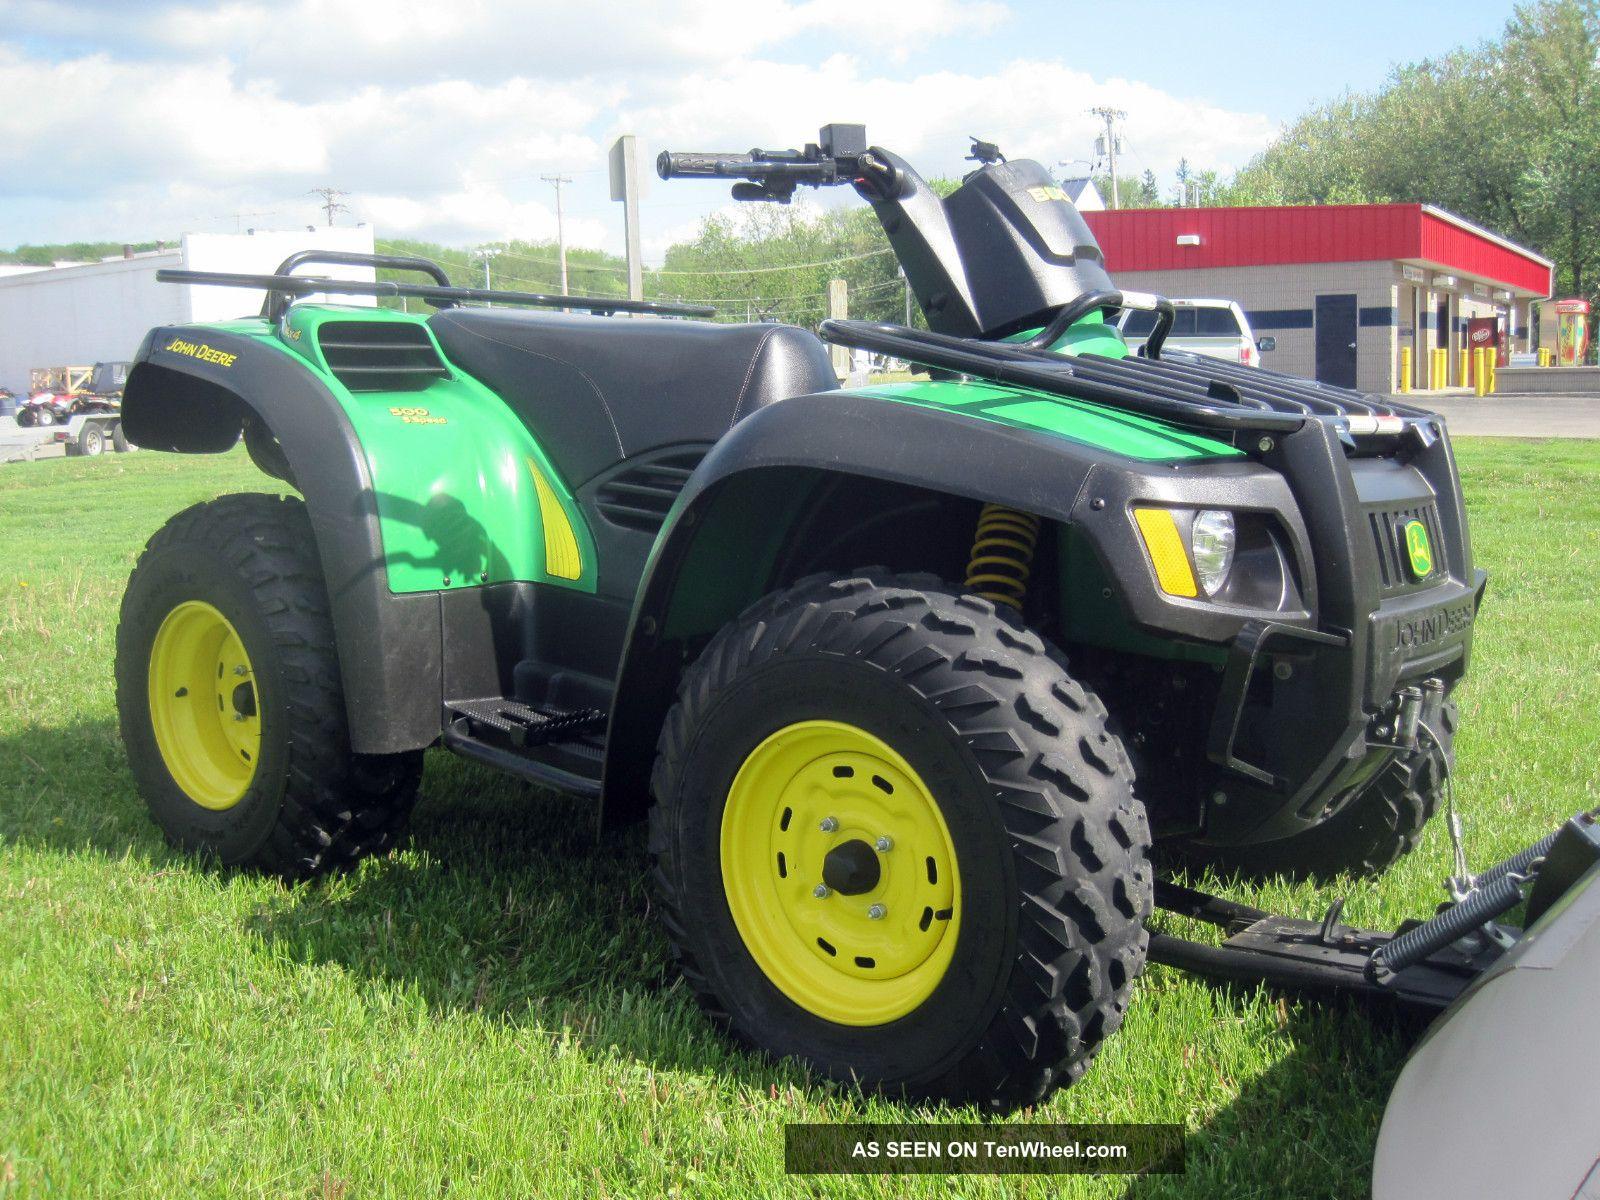 2005 Yamaha Rhino 660 Specs >> 2005 John Deere Buck 500